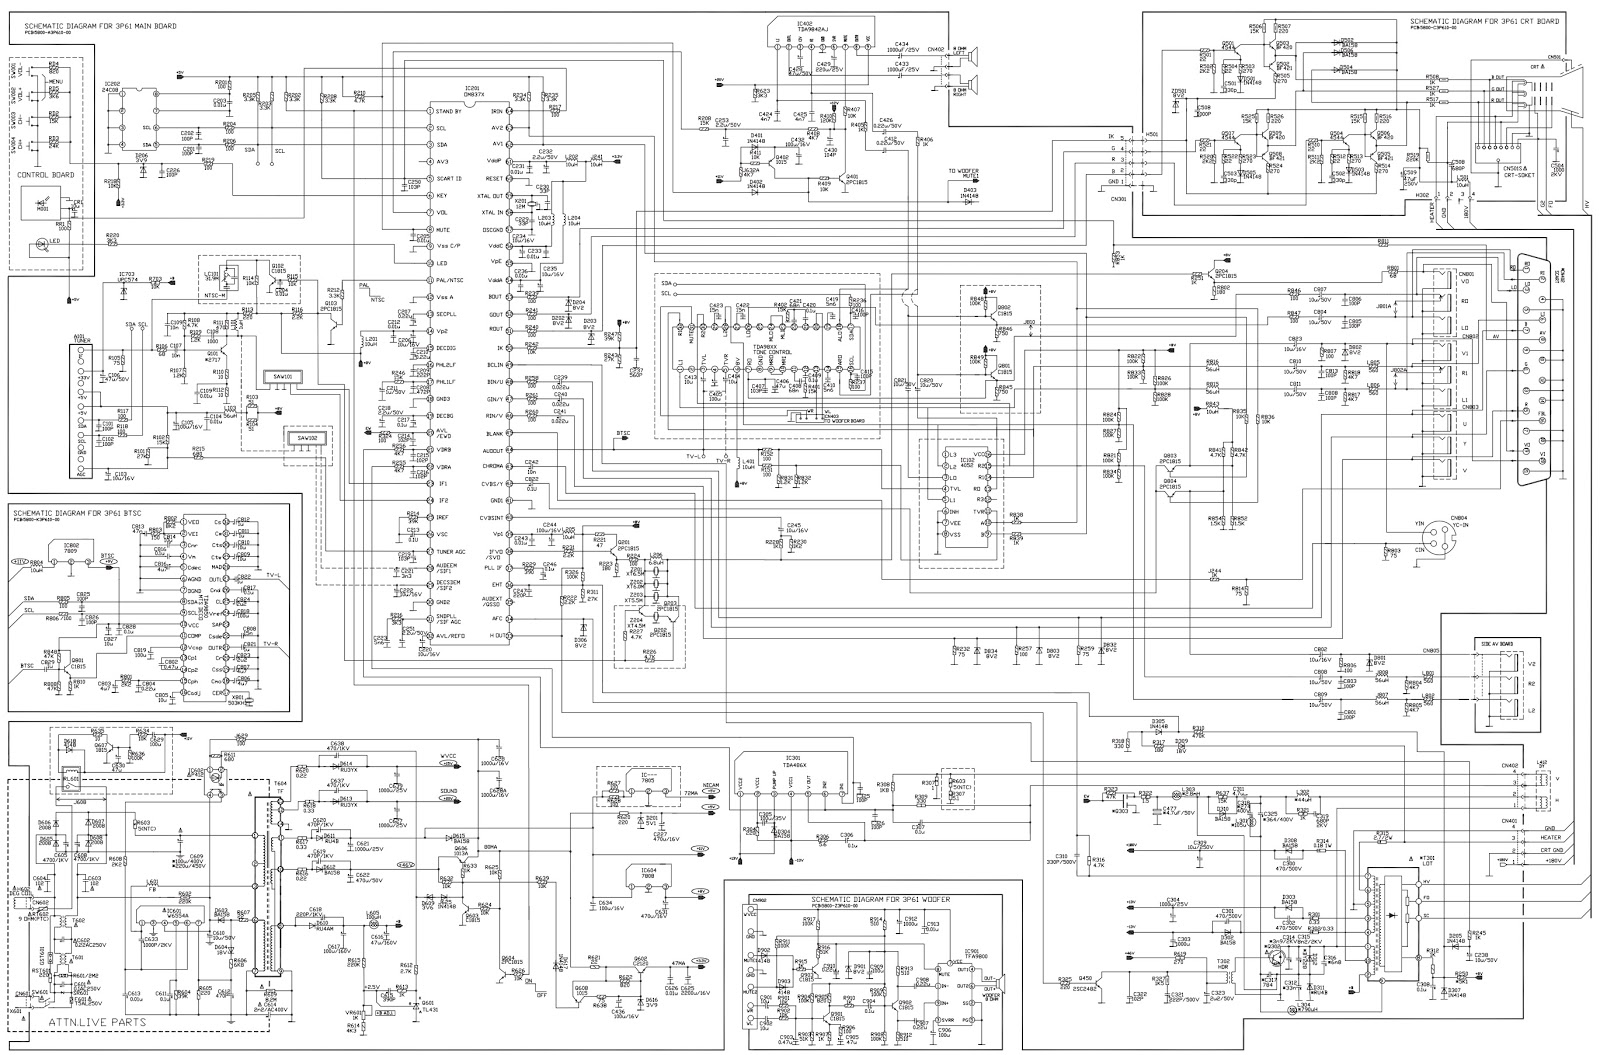 medium resolution of  jvc samsung crt tv schematic diagram circuit and wiring diagram schematic diagram for samsing slim crt